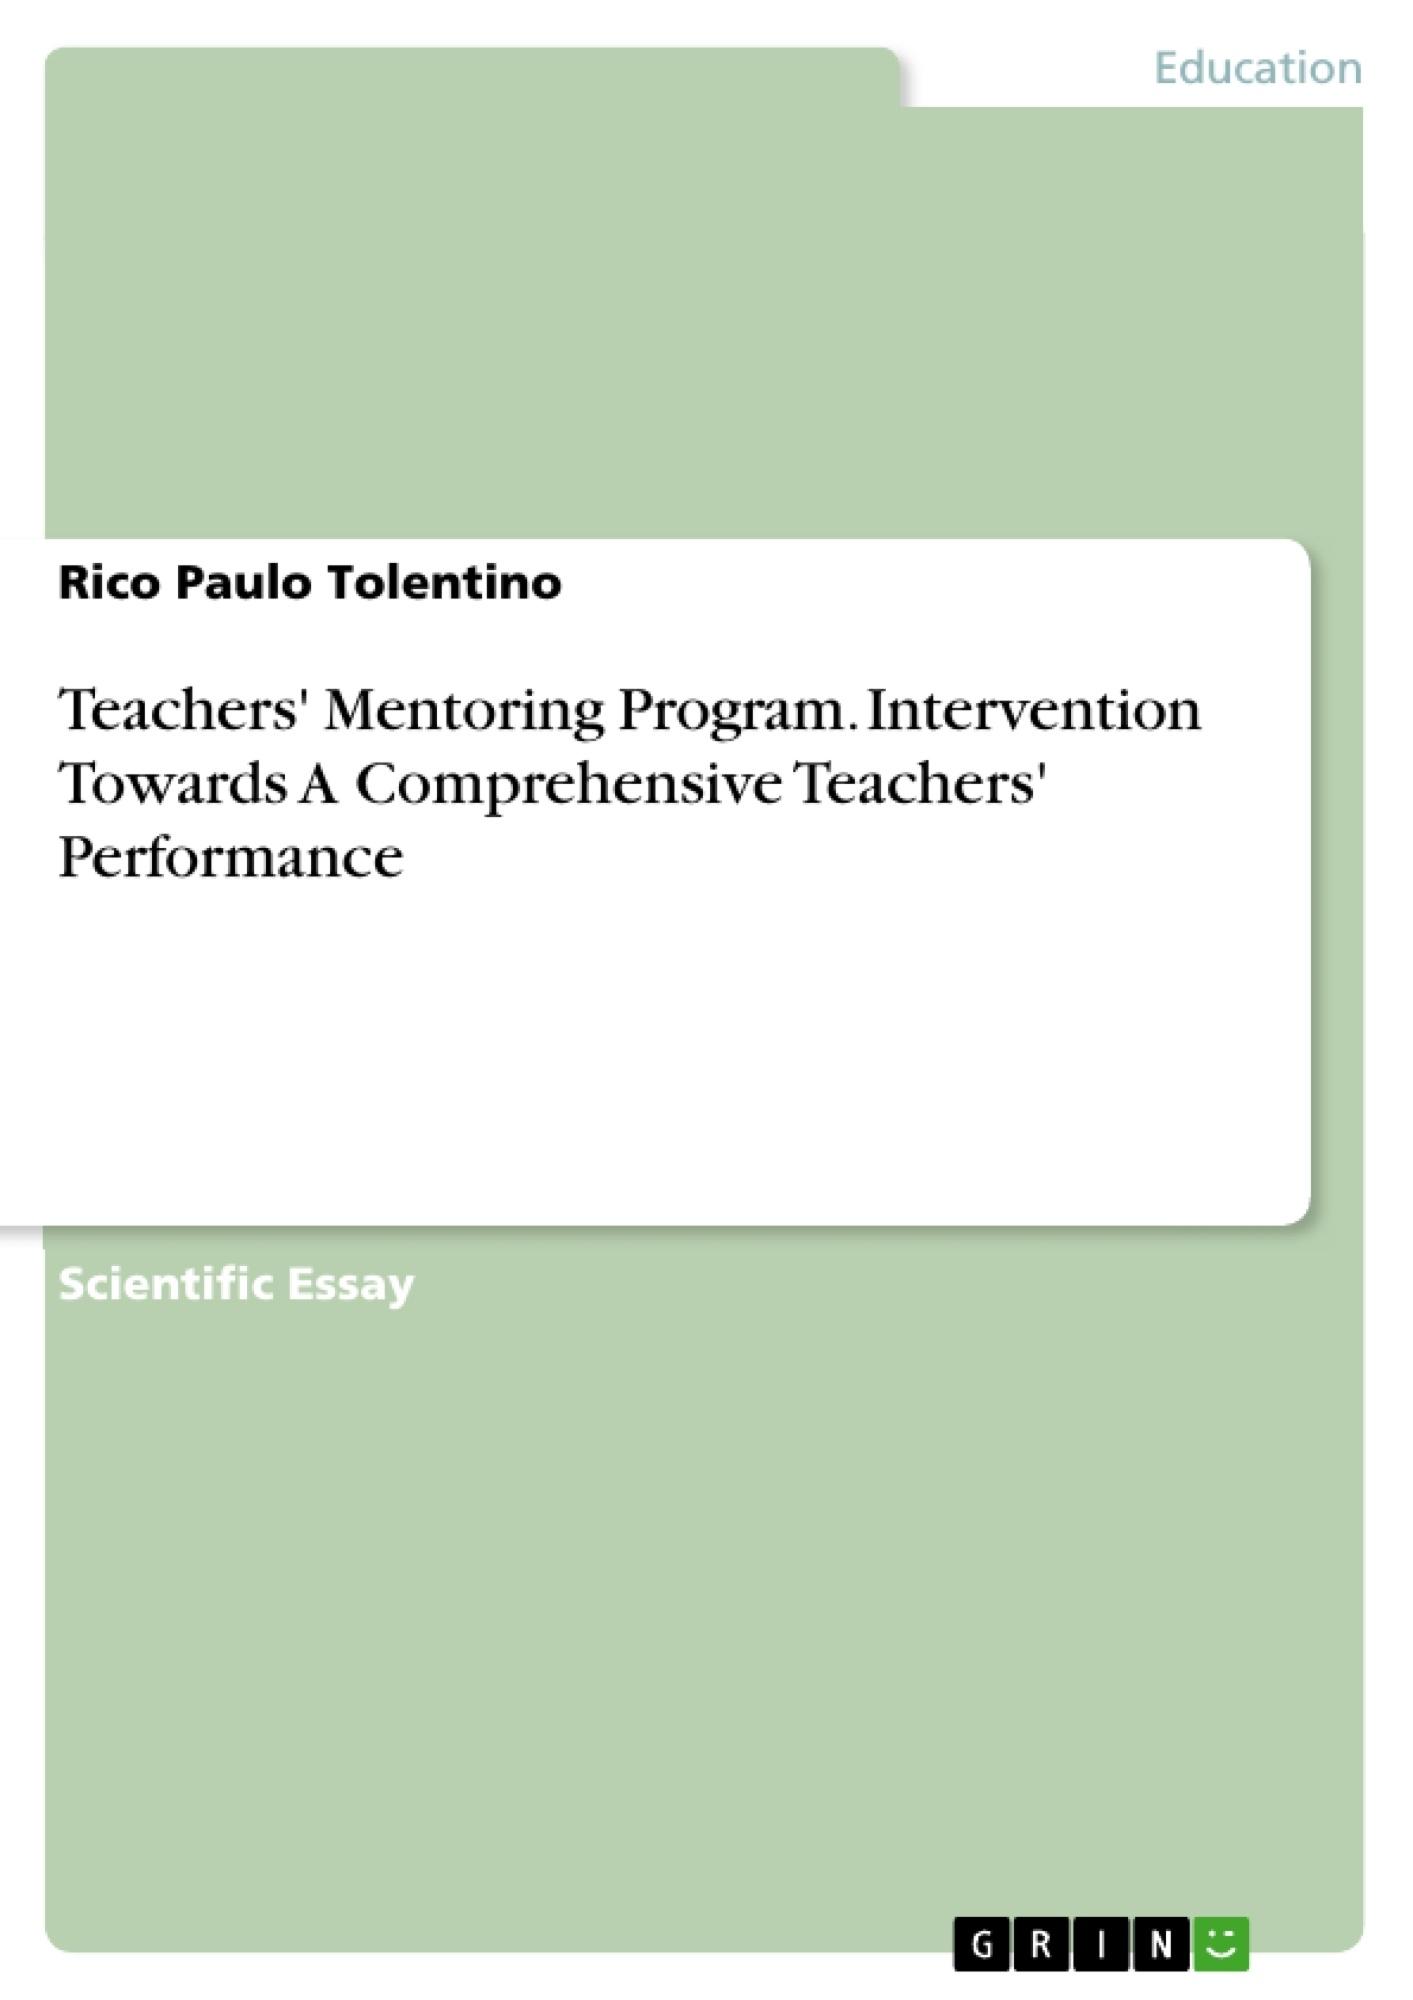 Title: Teachers' Mentoring Program. Intervention Towards A Comprehensive Teachers' Performance